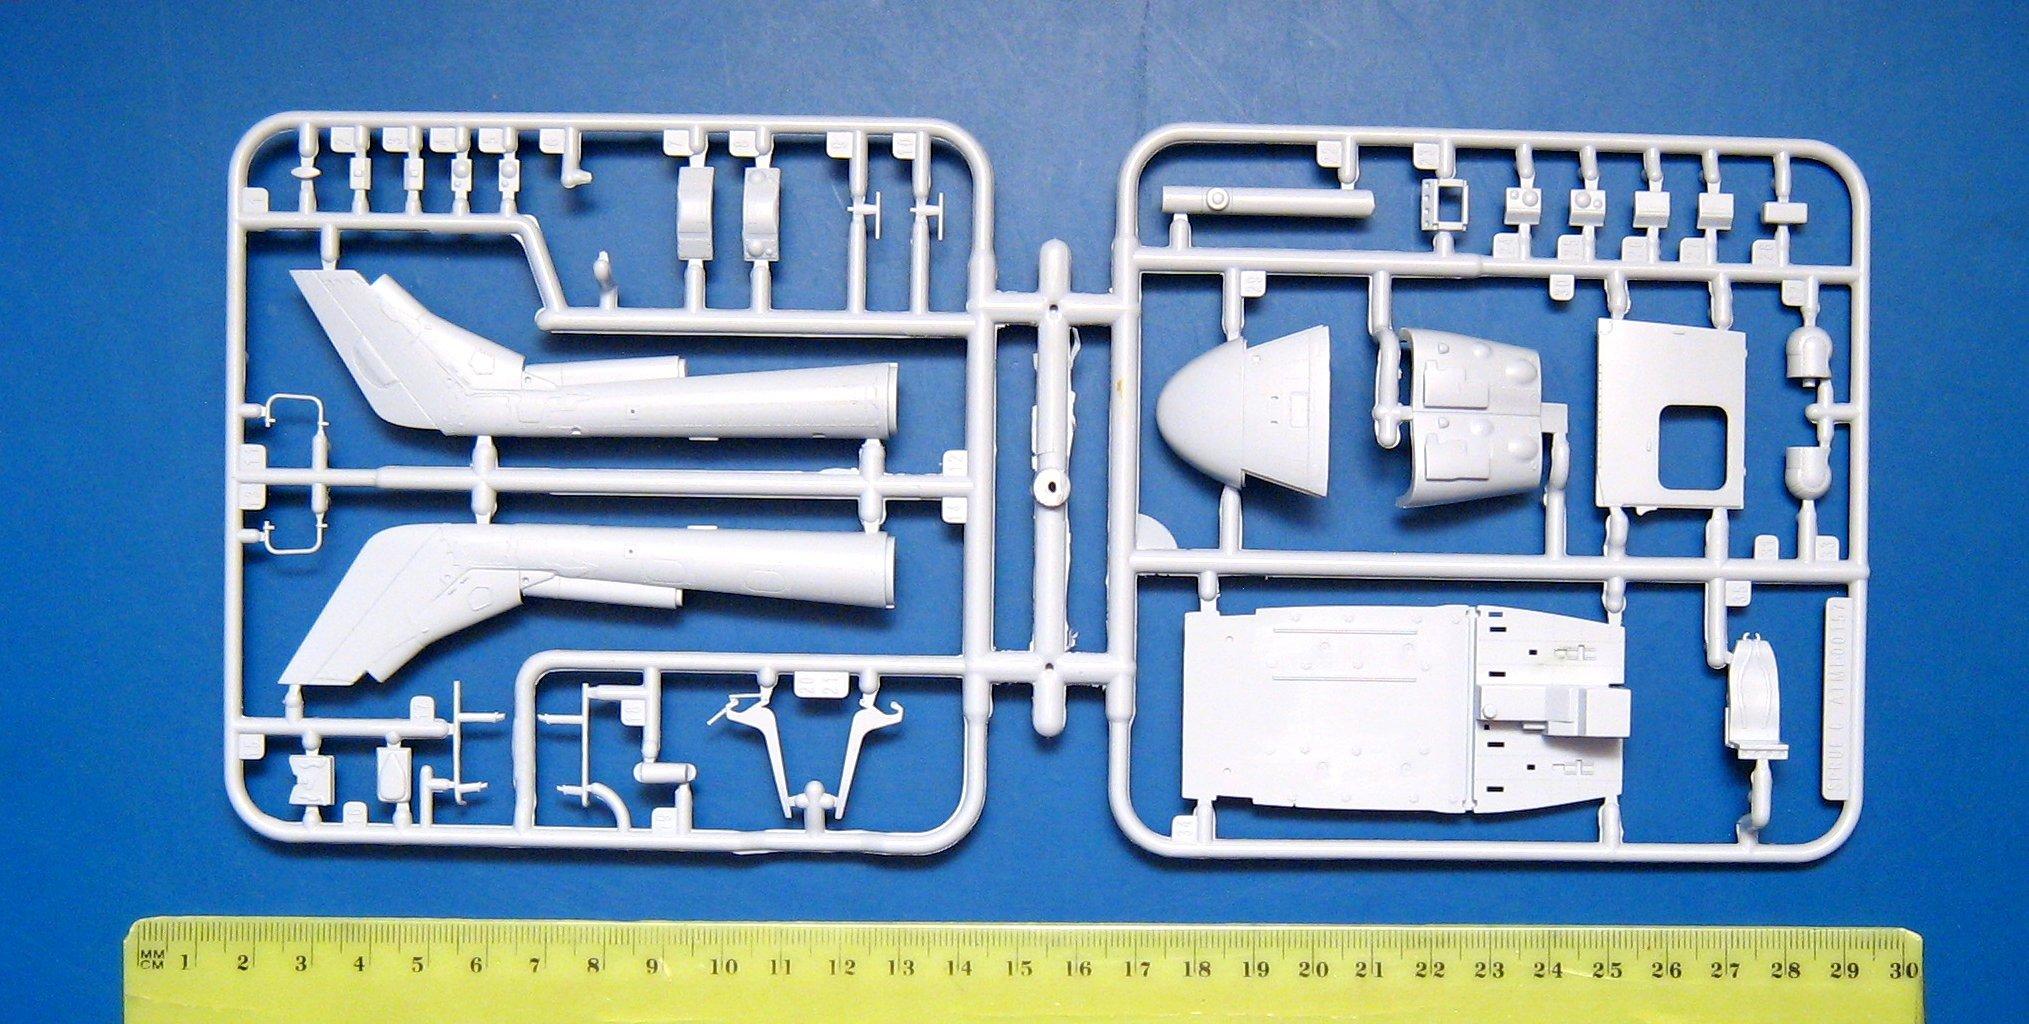 WWP Westland Lynx in detail walkaround reference book No.9